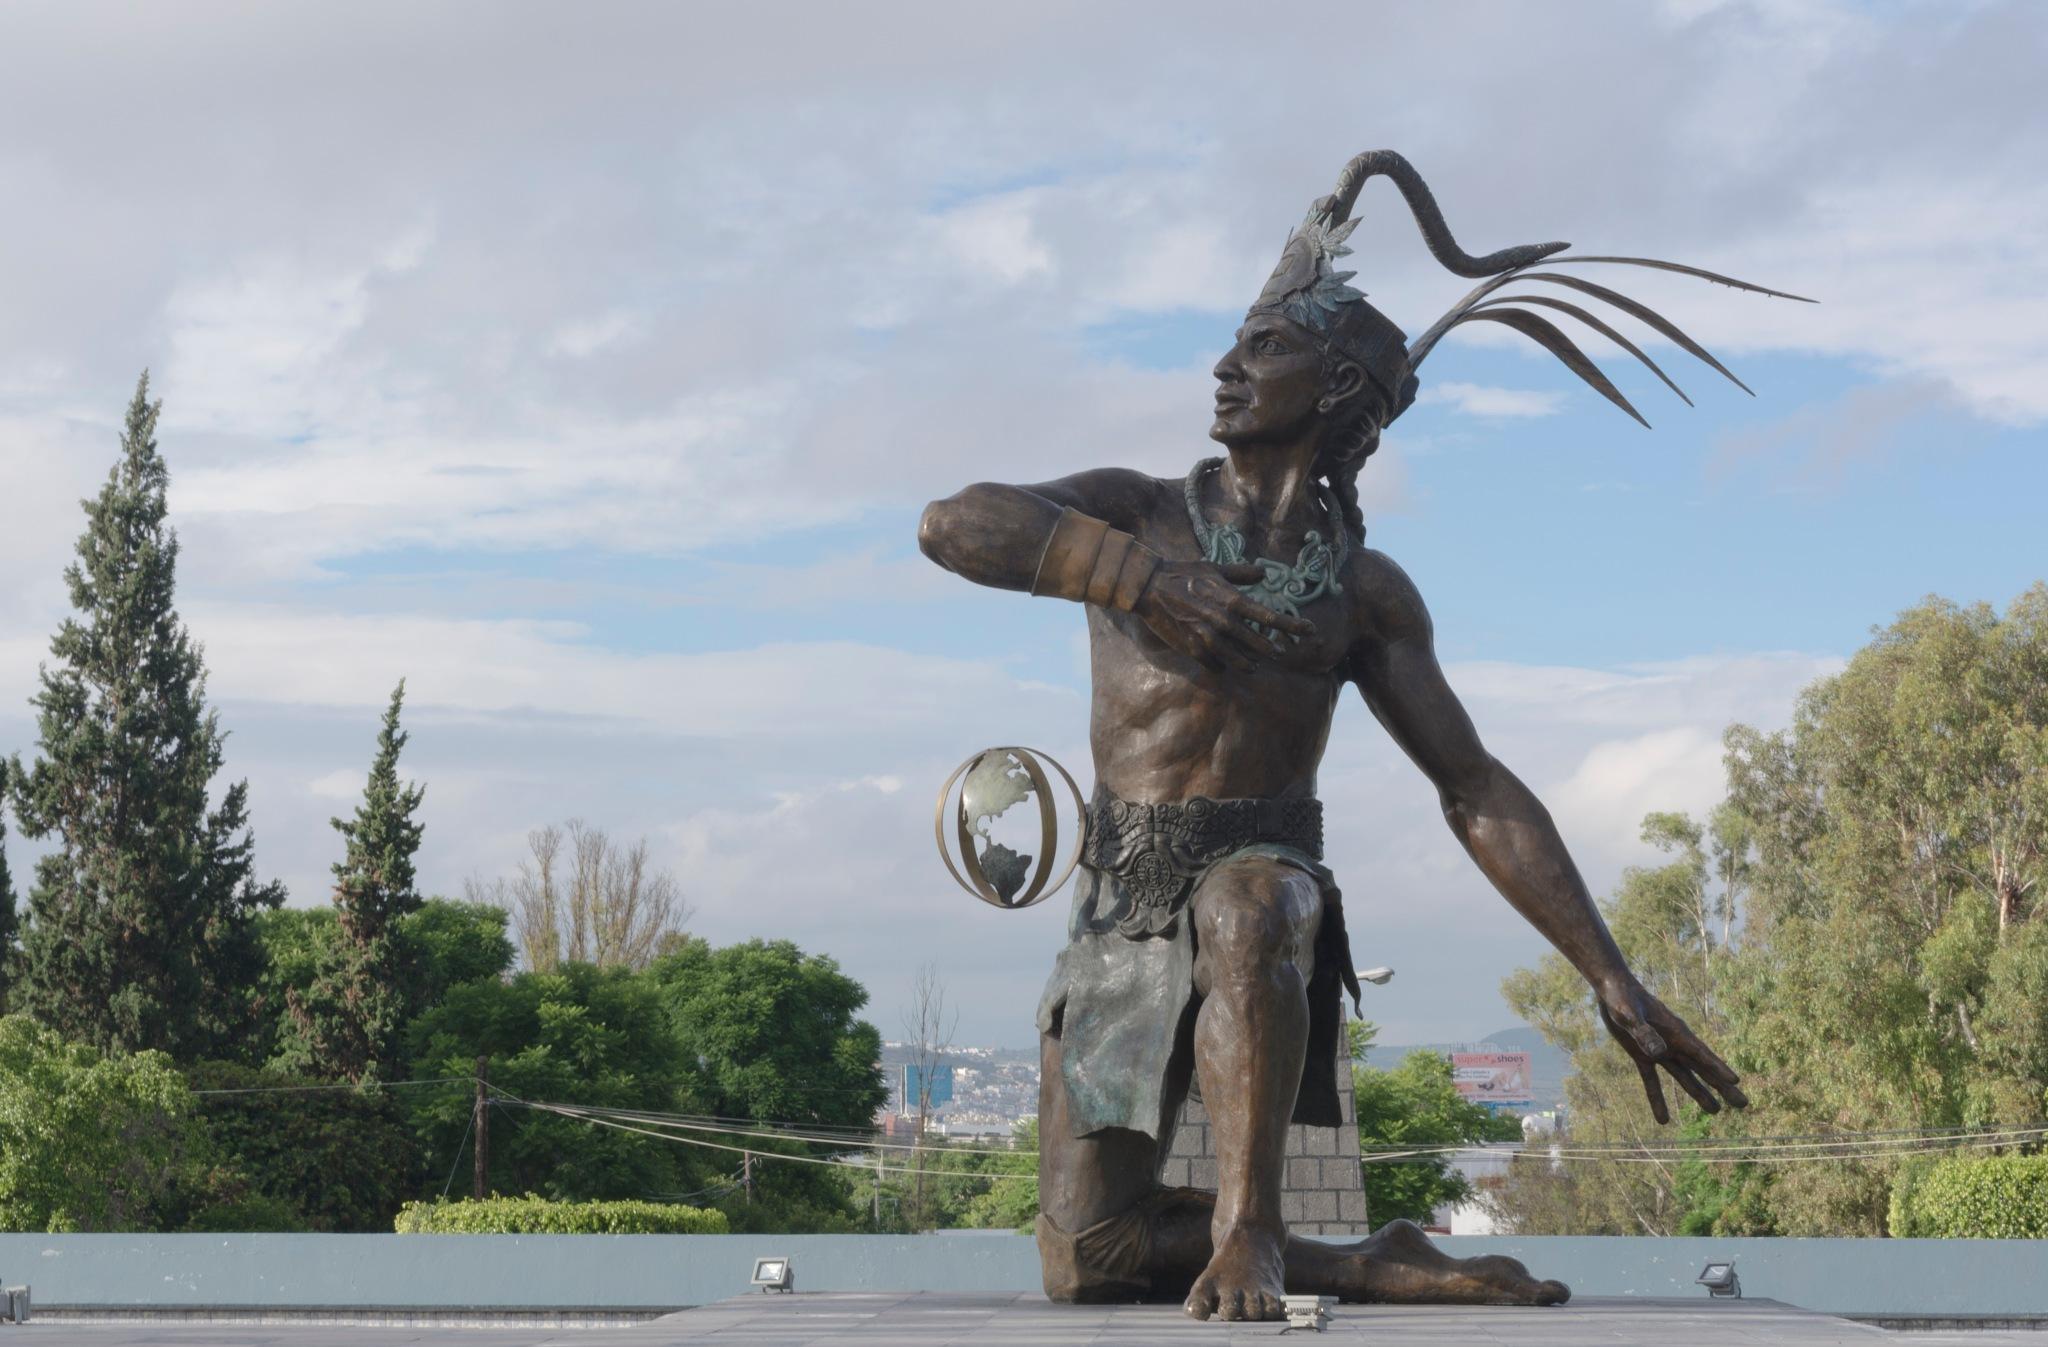 Sculpture 2 by David Foster Barnes